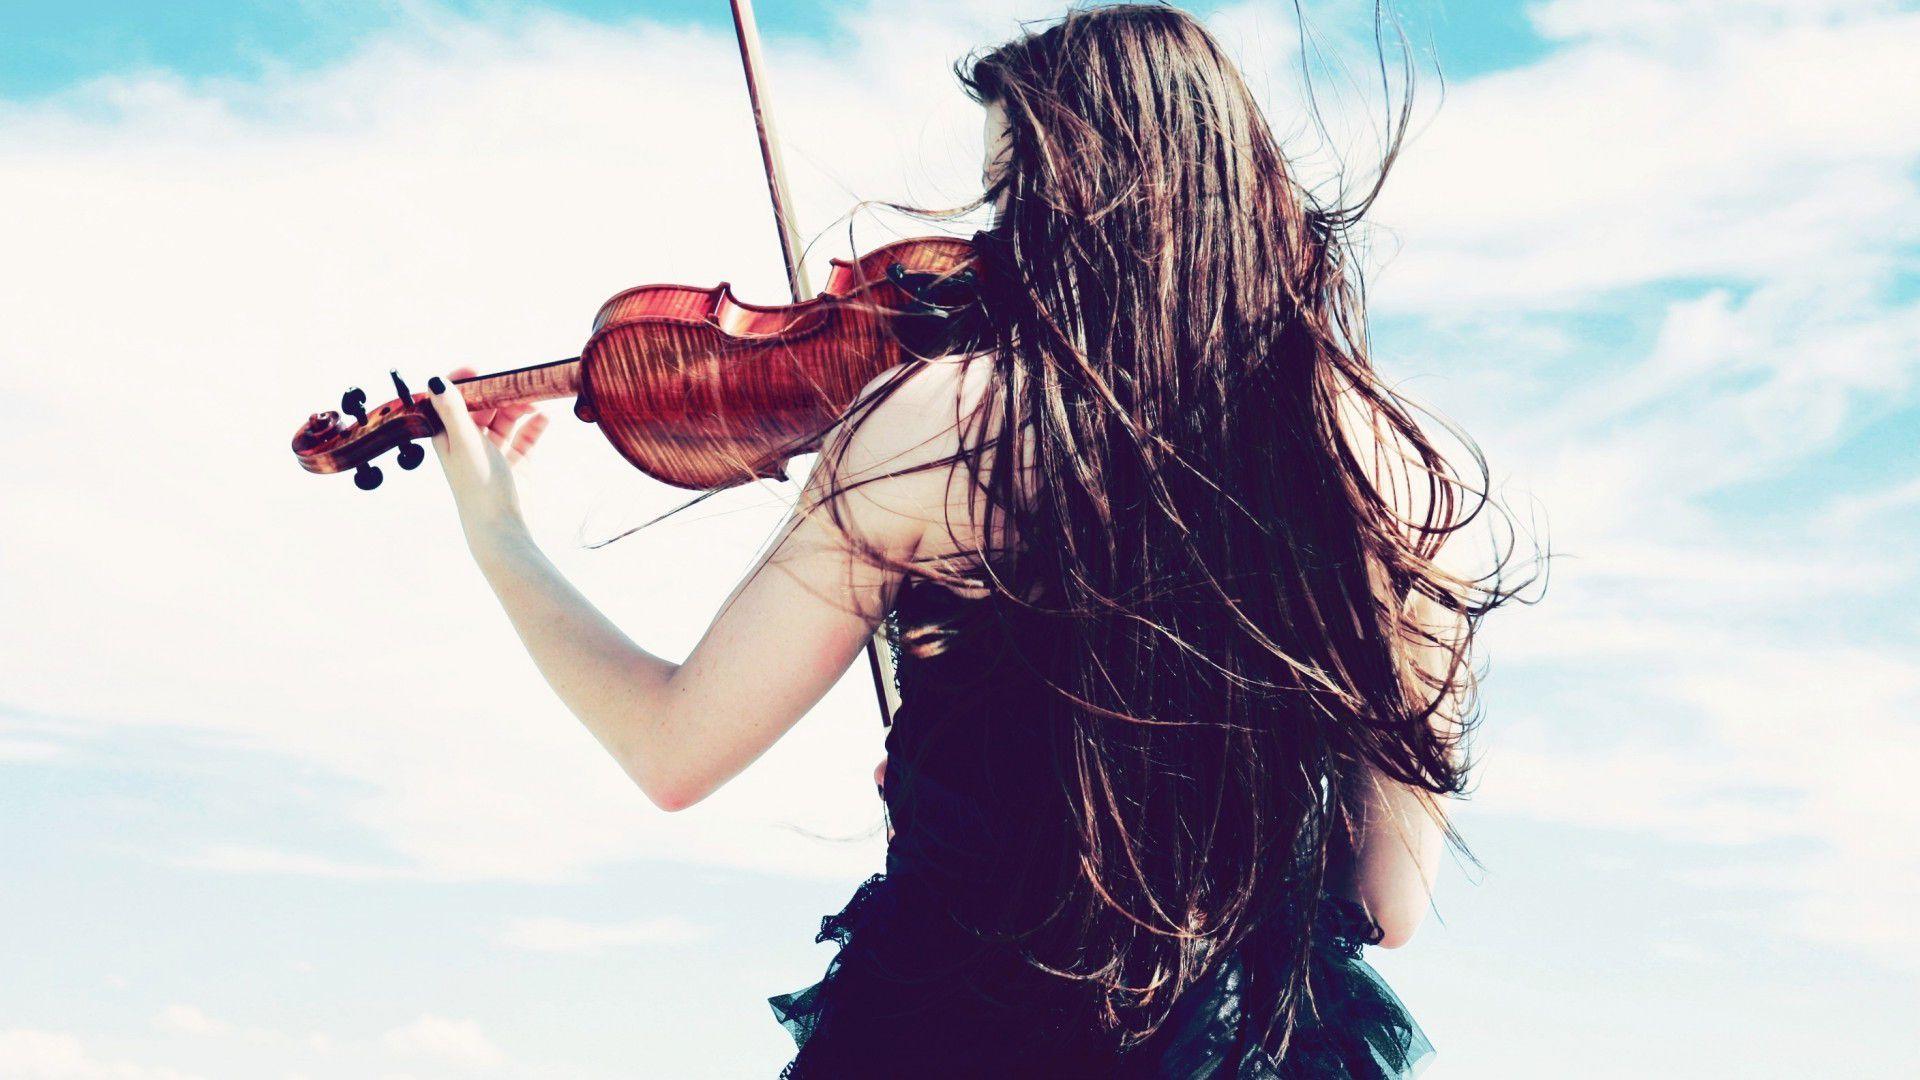 Music hd image